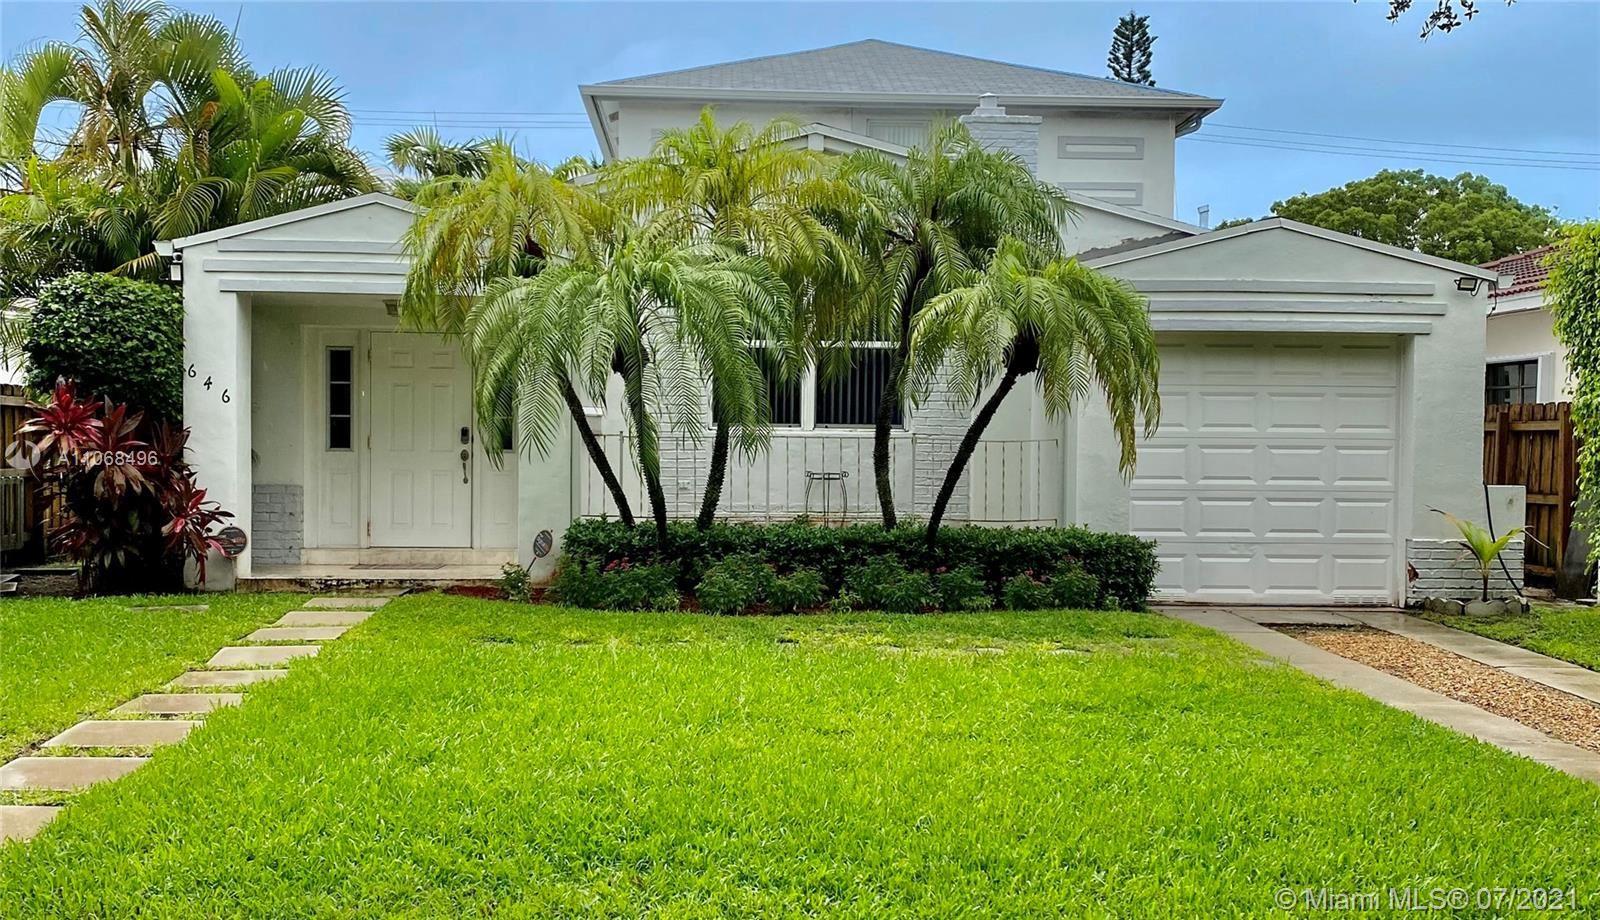 646 W 51st St, Miami Beach, FL 33140 - #: A11068496